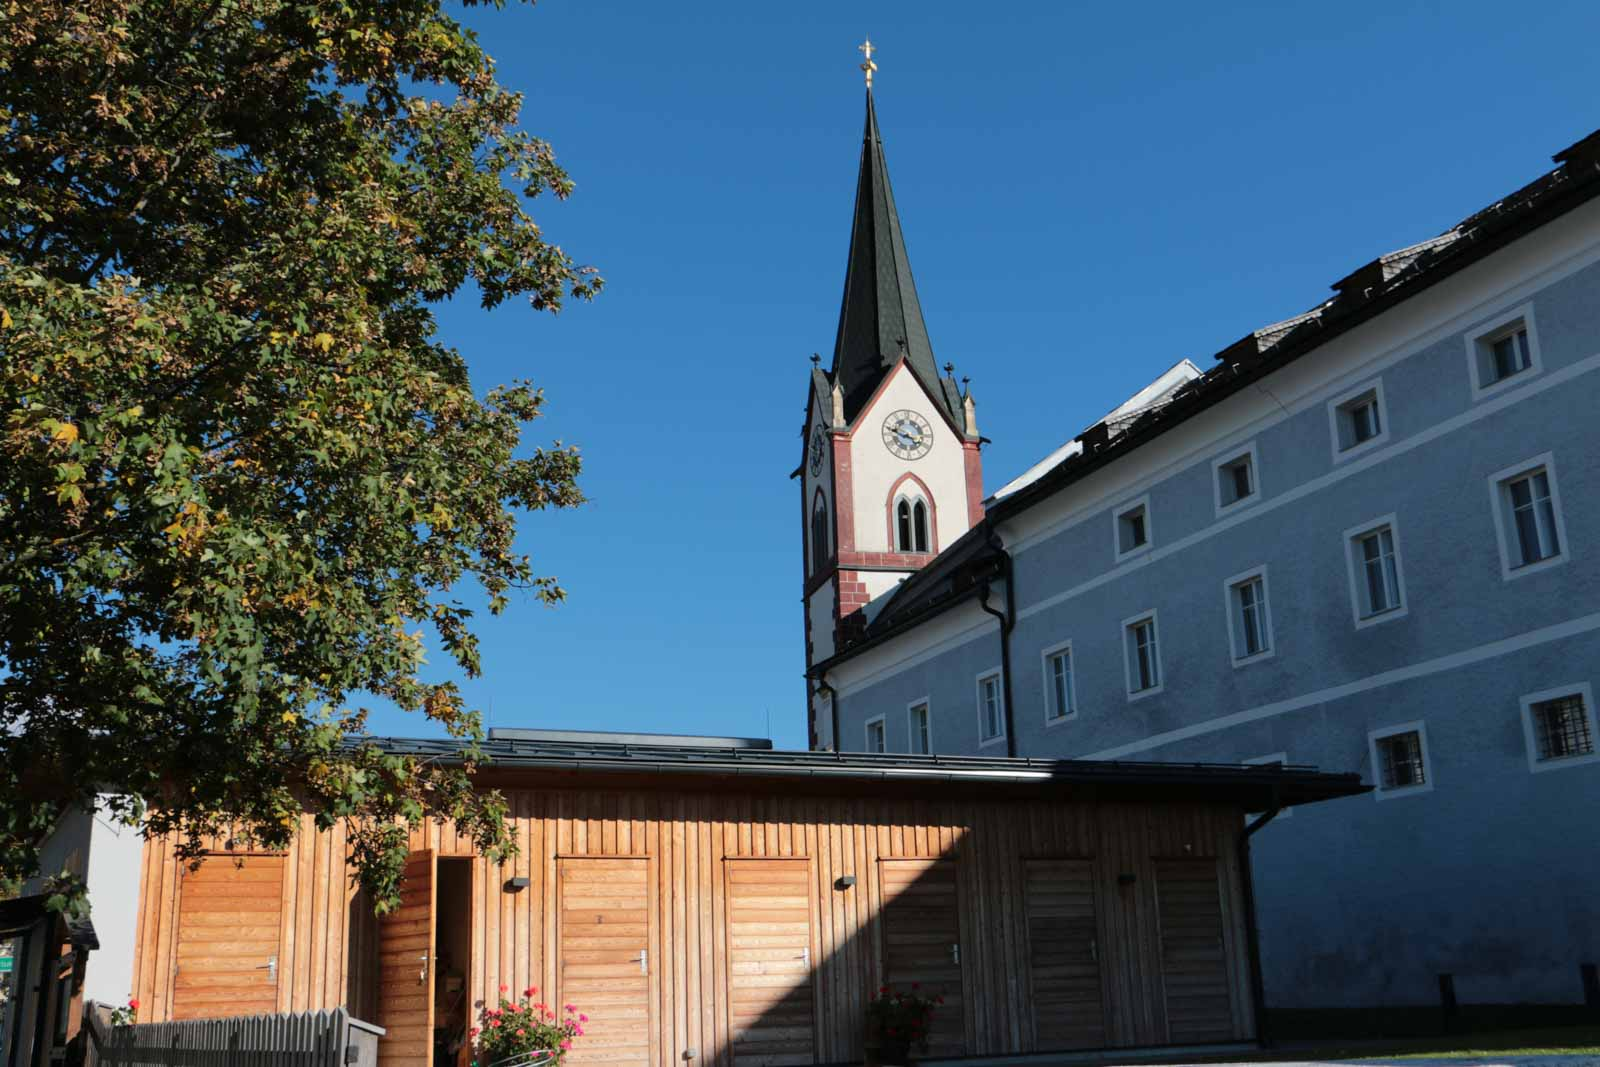 Sanierung pfarrhof mariapfarr holzbau mauterndorf for Architekt planung